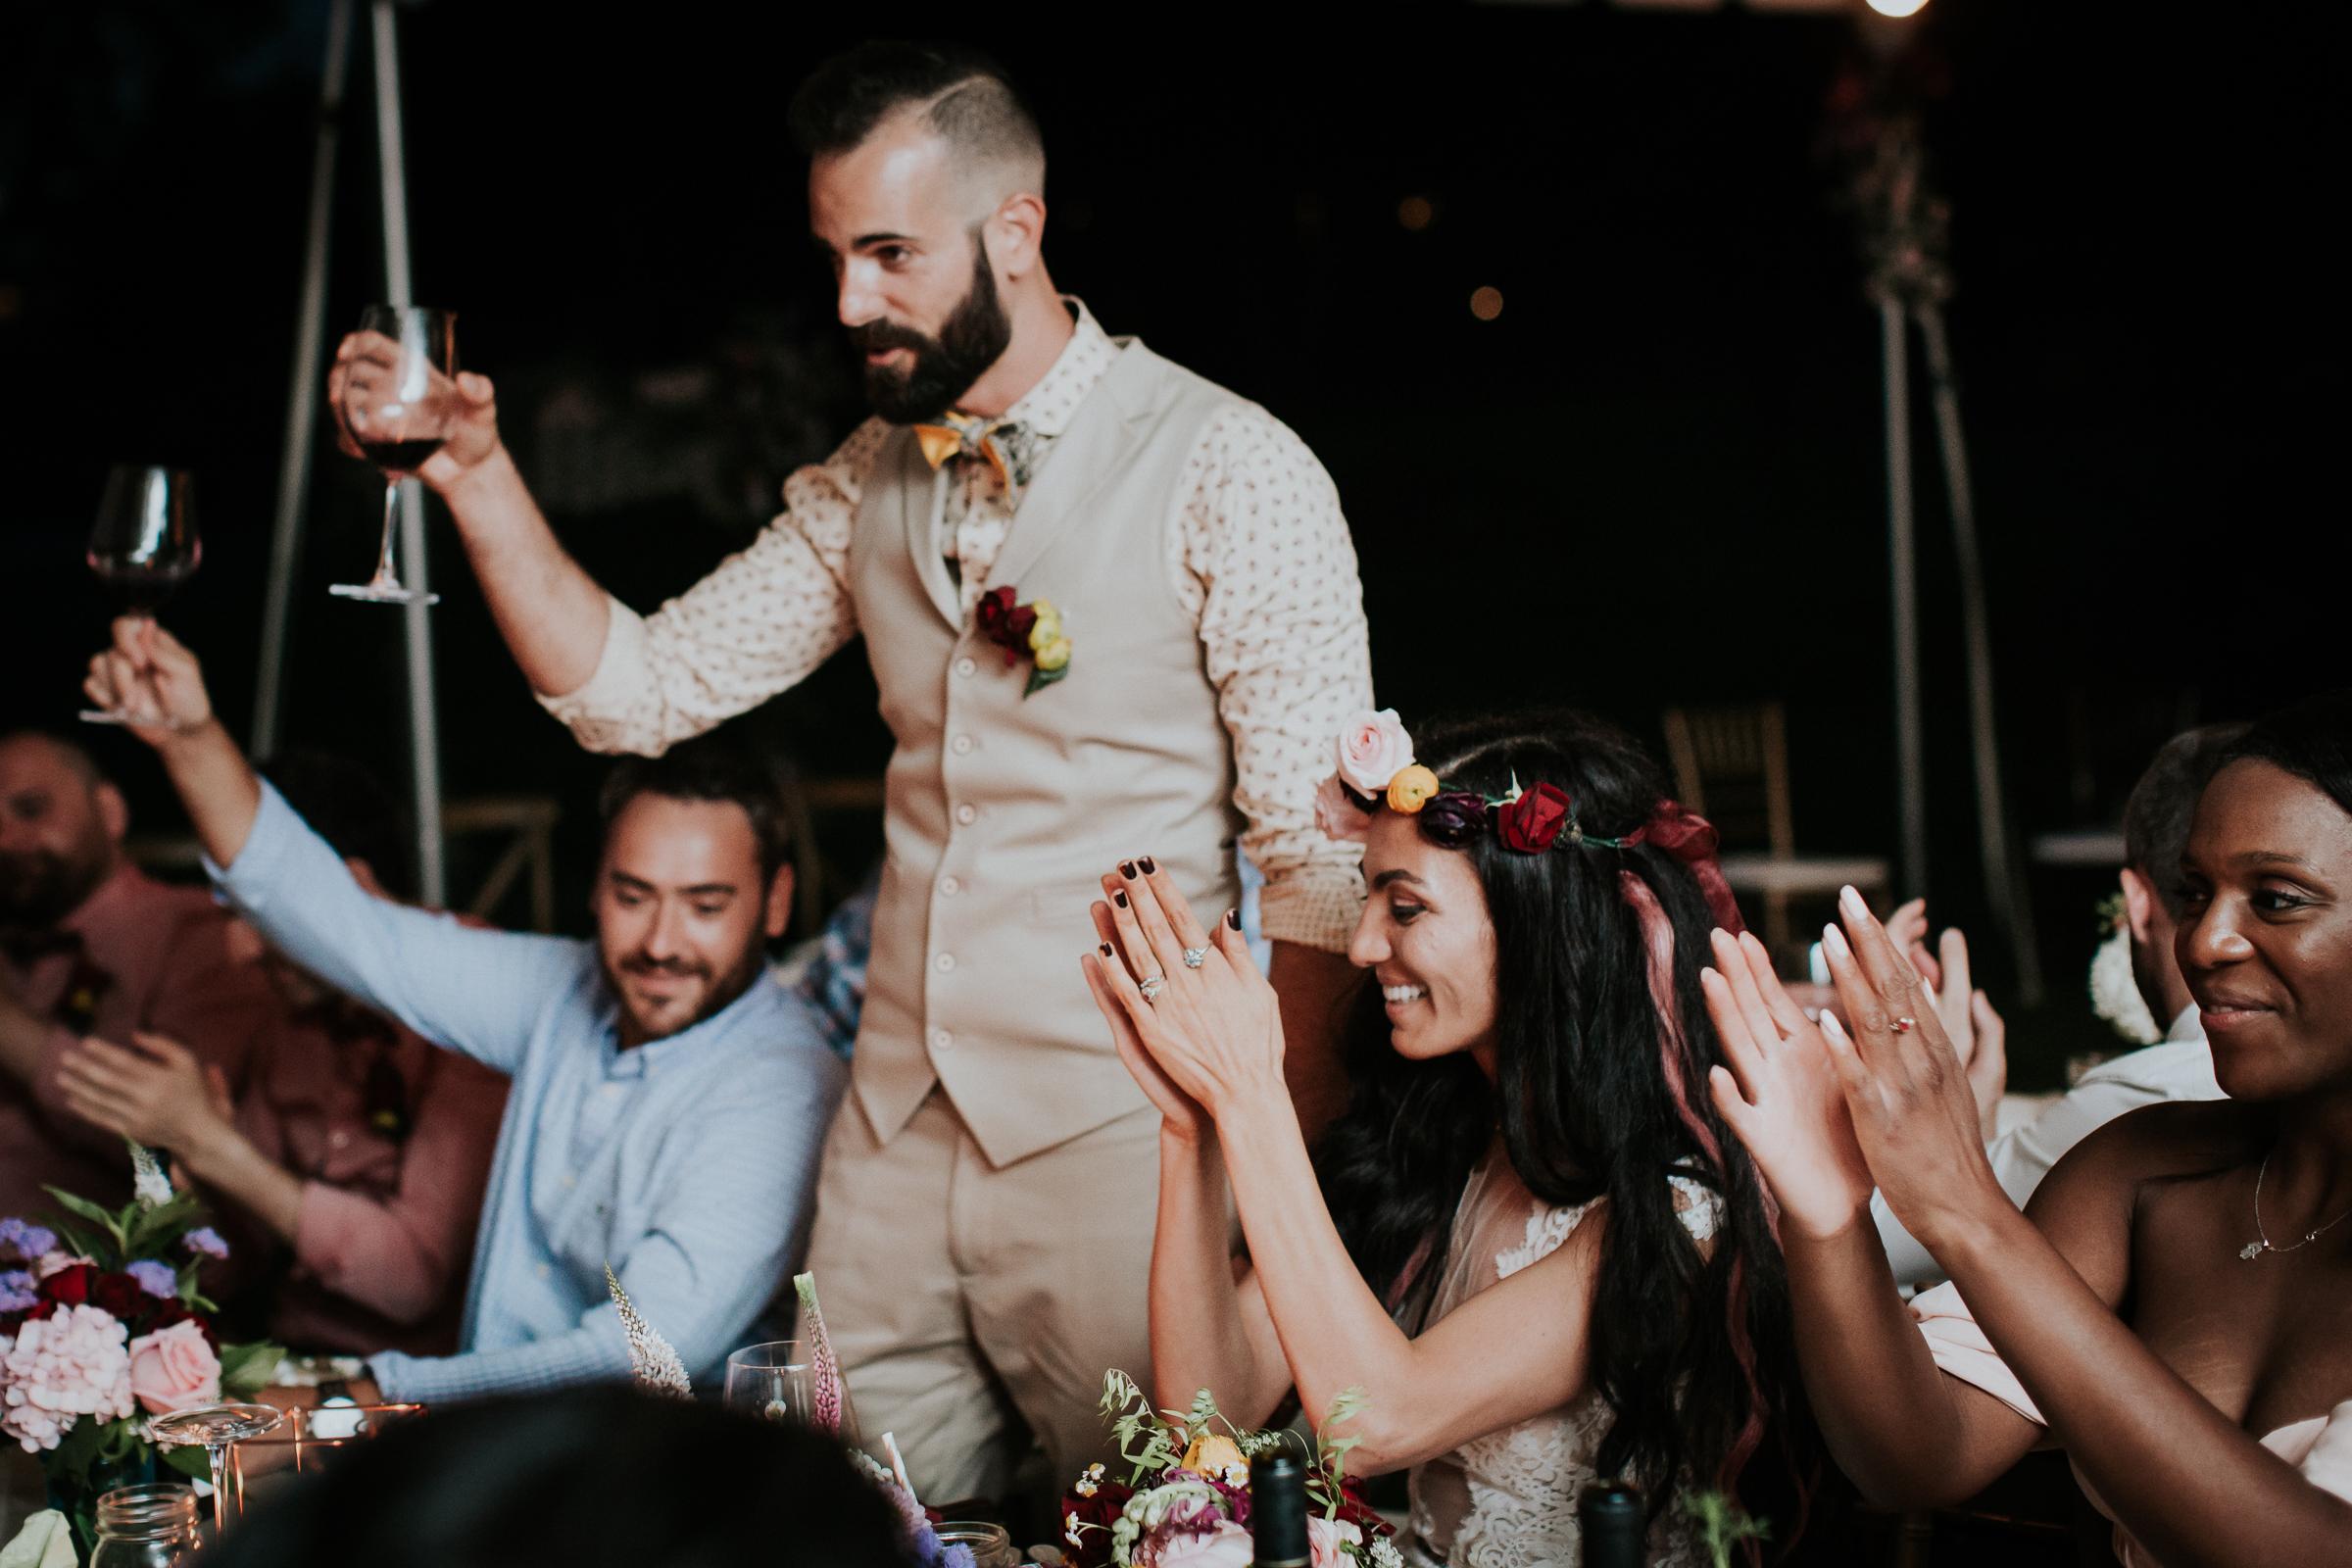 Backyard-Intimate-Adventurous-Destination-Wedding-Darien-Connecticut-Documentary-Wedding-Photography-118.jpg